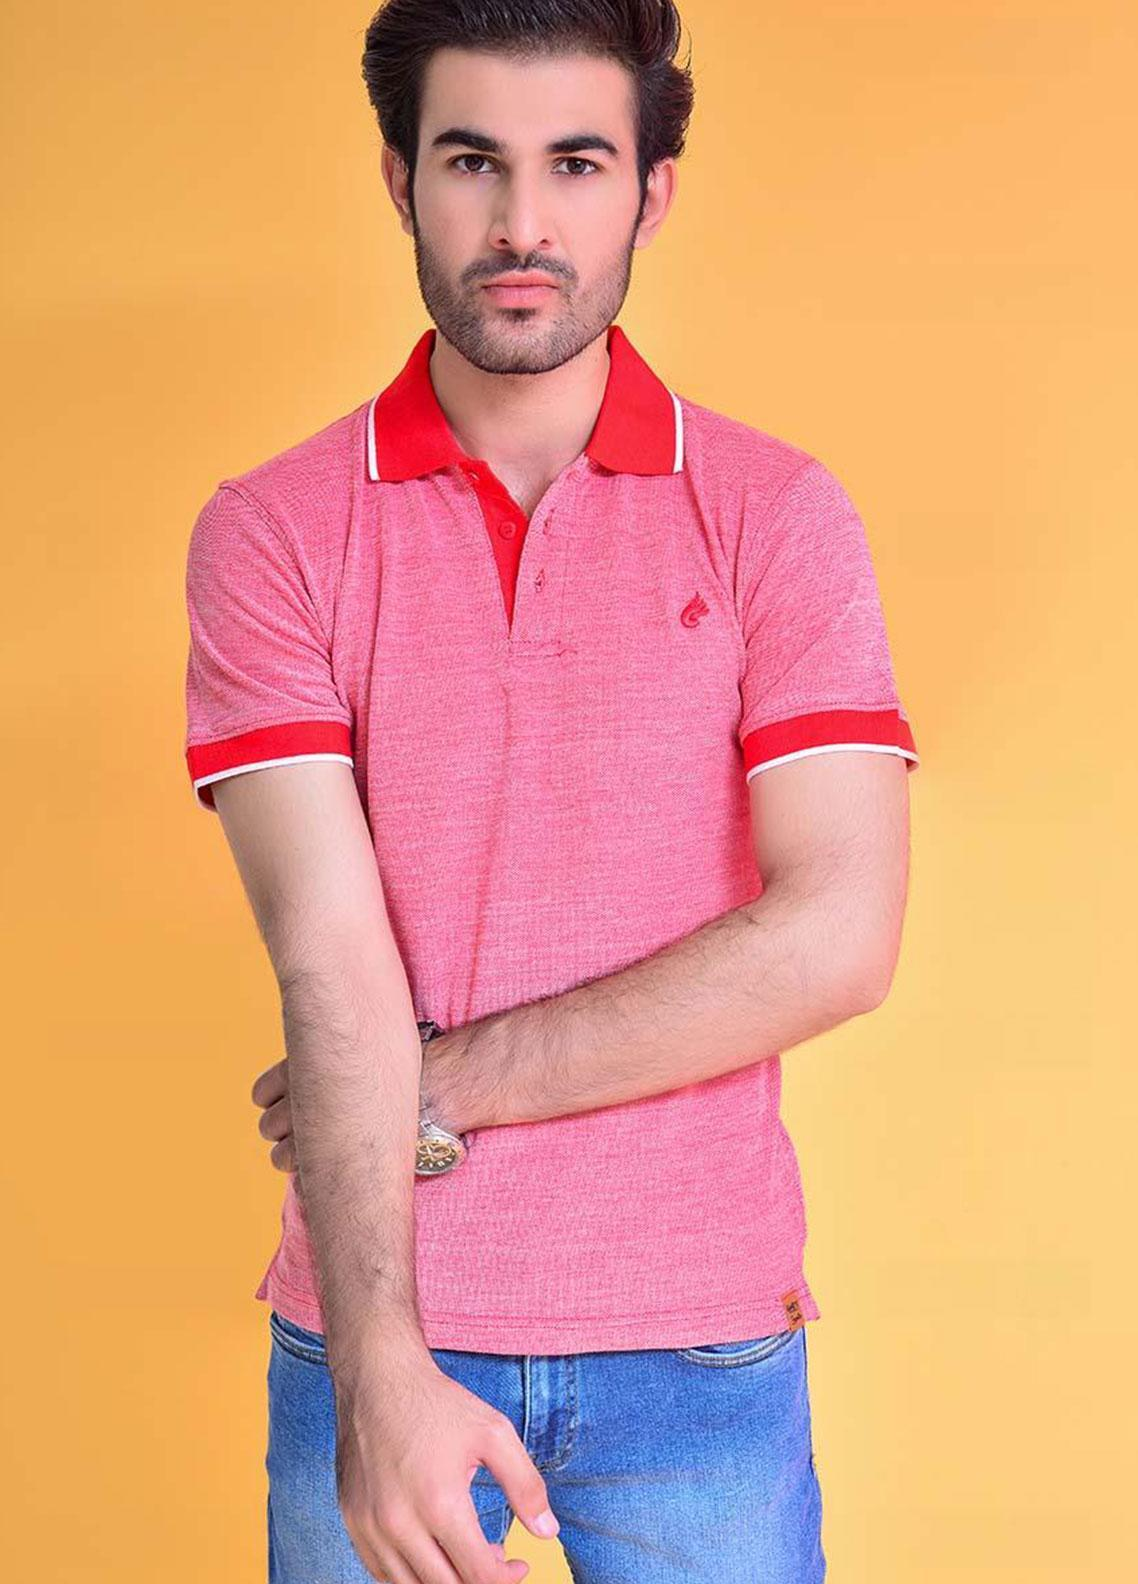 Ignite Wardrobe Cotton Dyed Polo Shirt for Men -  IG20POM 005